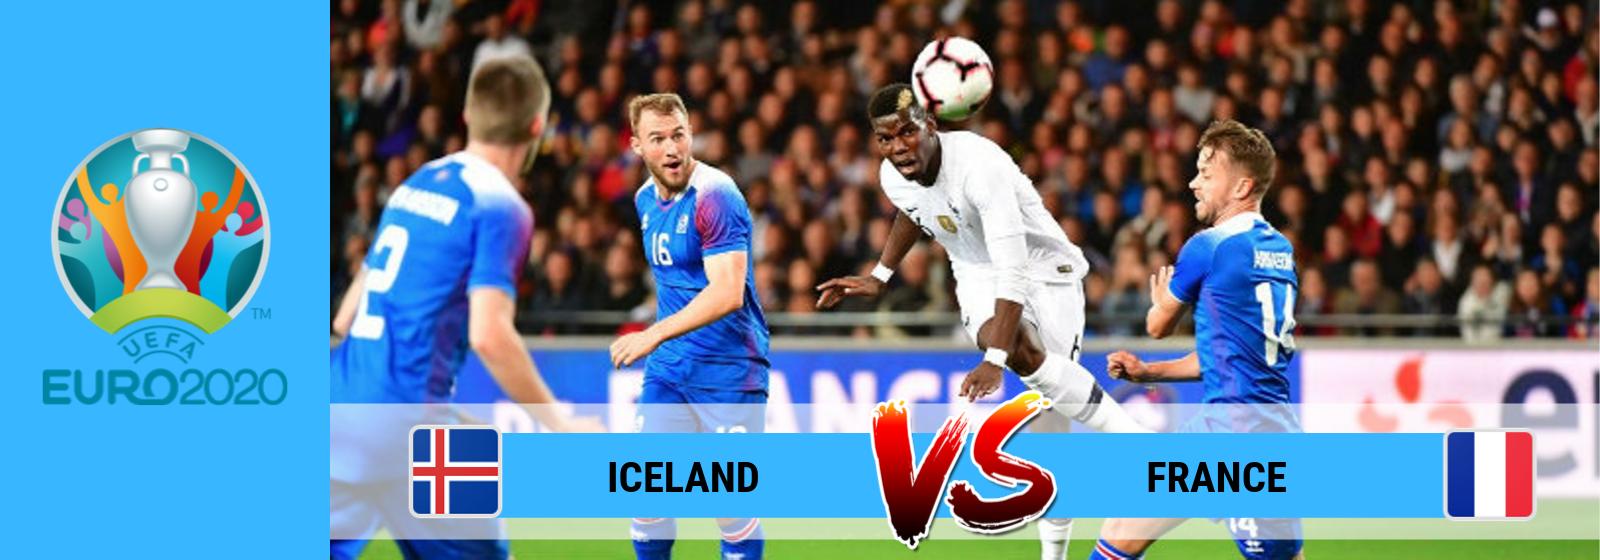 UEFA Euro 2020 Iceland Vs. France Asian Connect